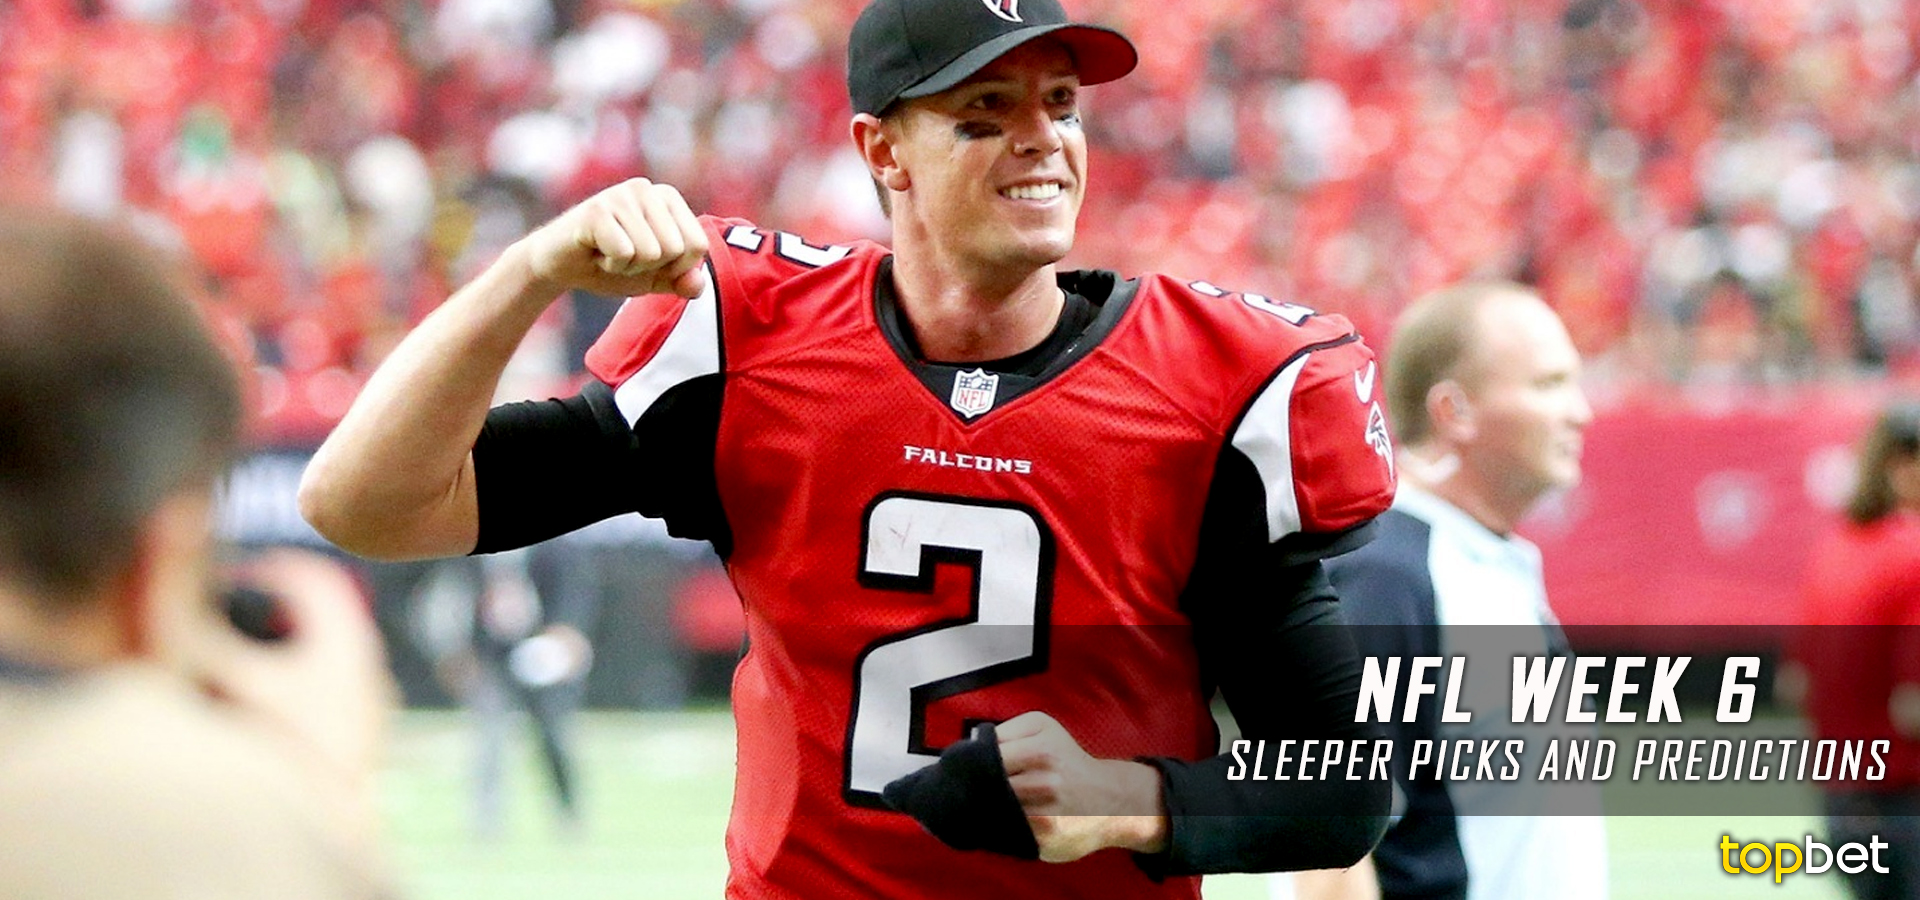 2016 Nfl Week 6 Sleeper Picks And Predictions